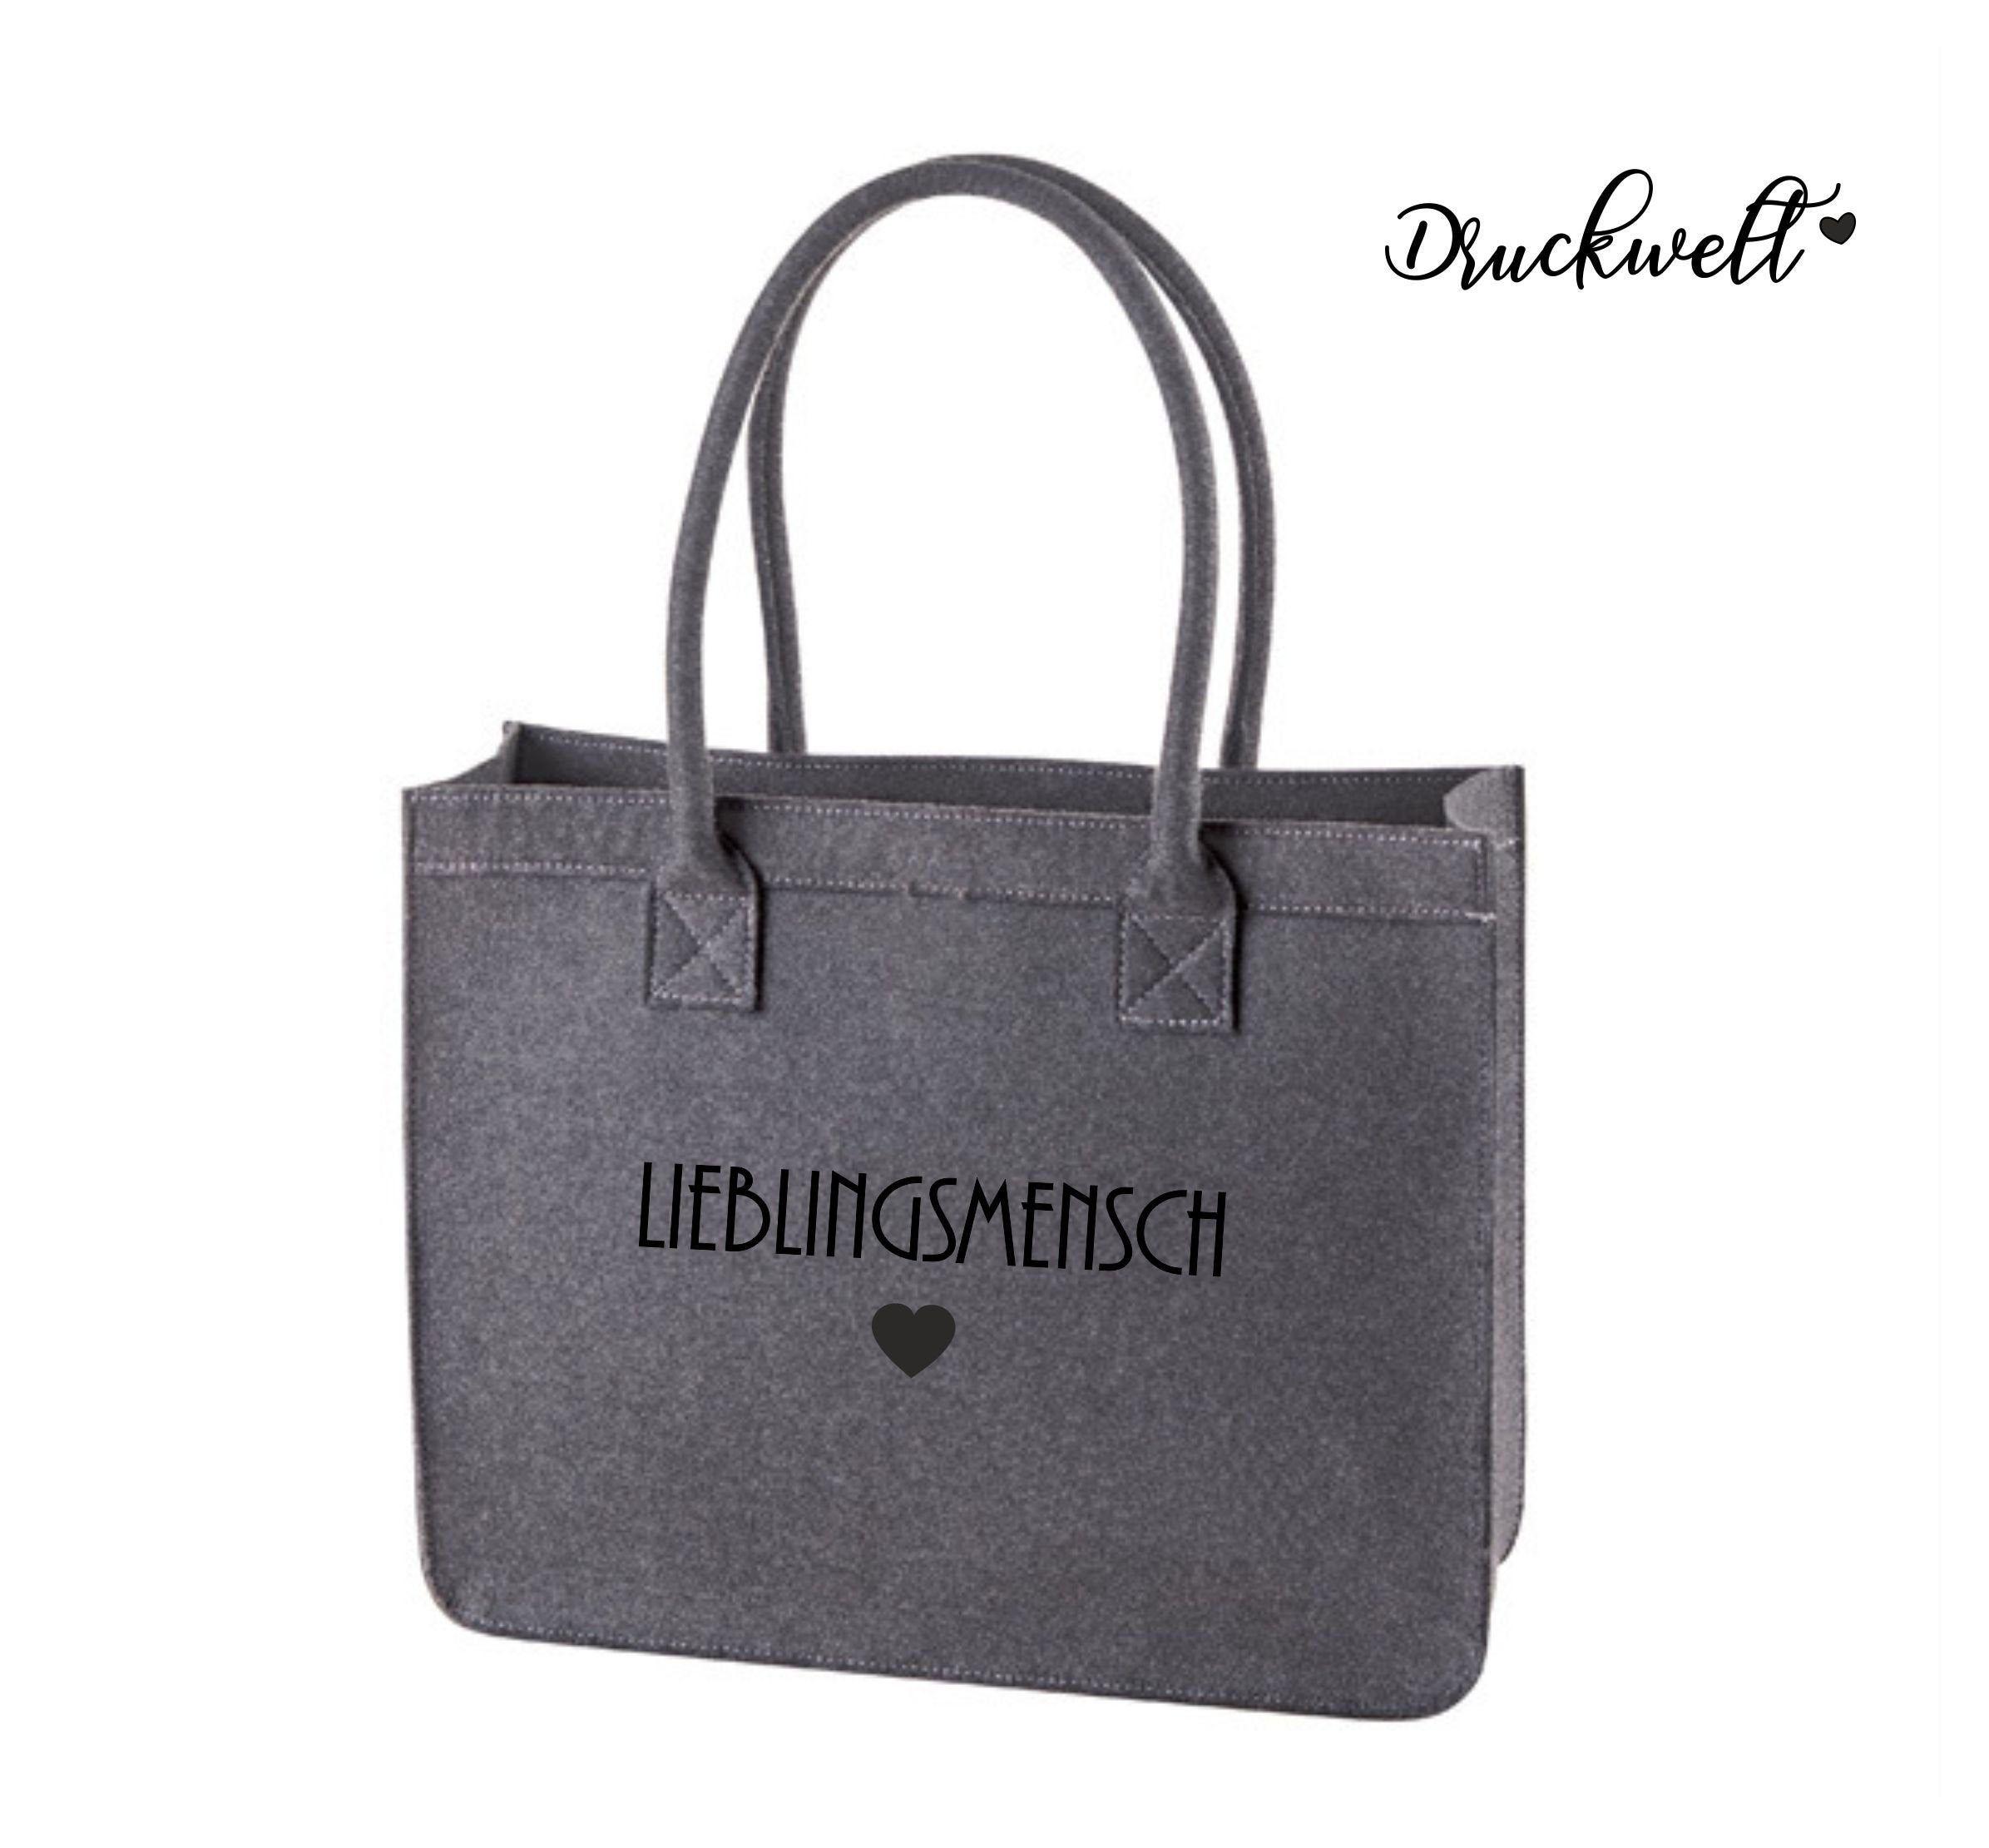 Filztasche BESTICKT mit Wunsch Namen Tasche Shopper Classic Einkaufstasche Bag